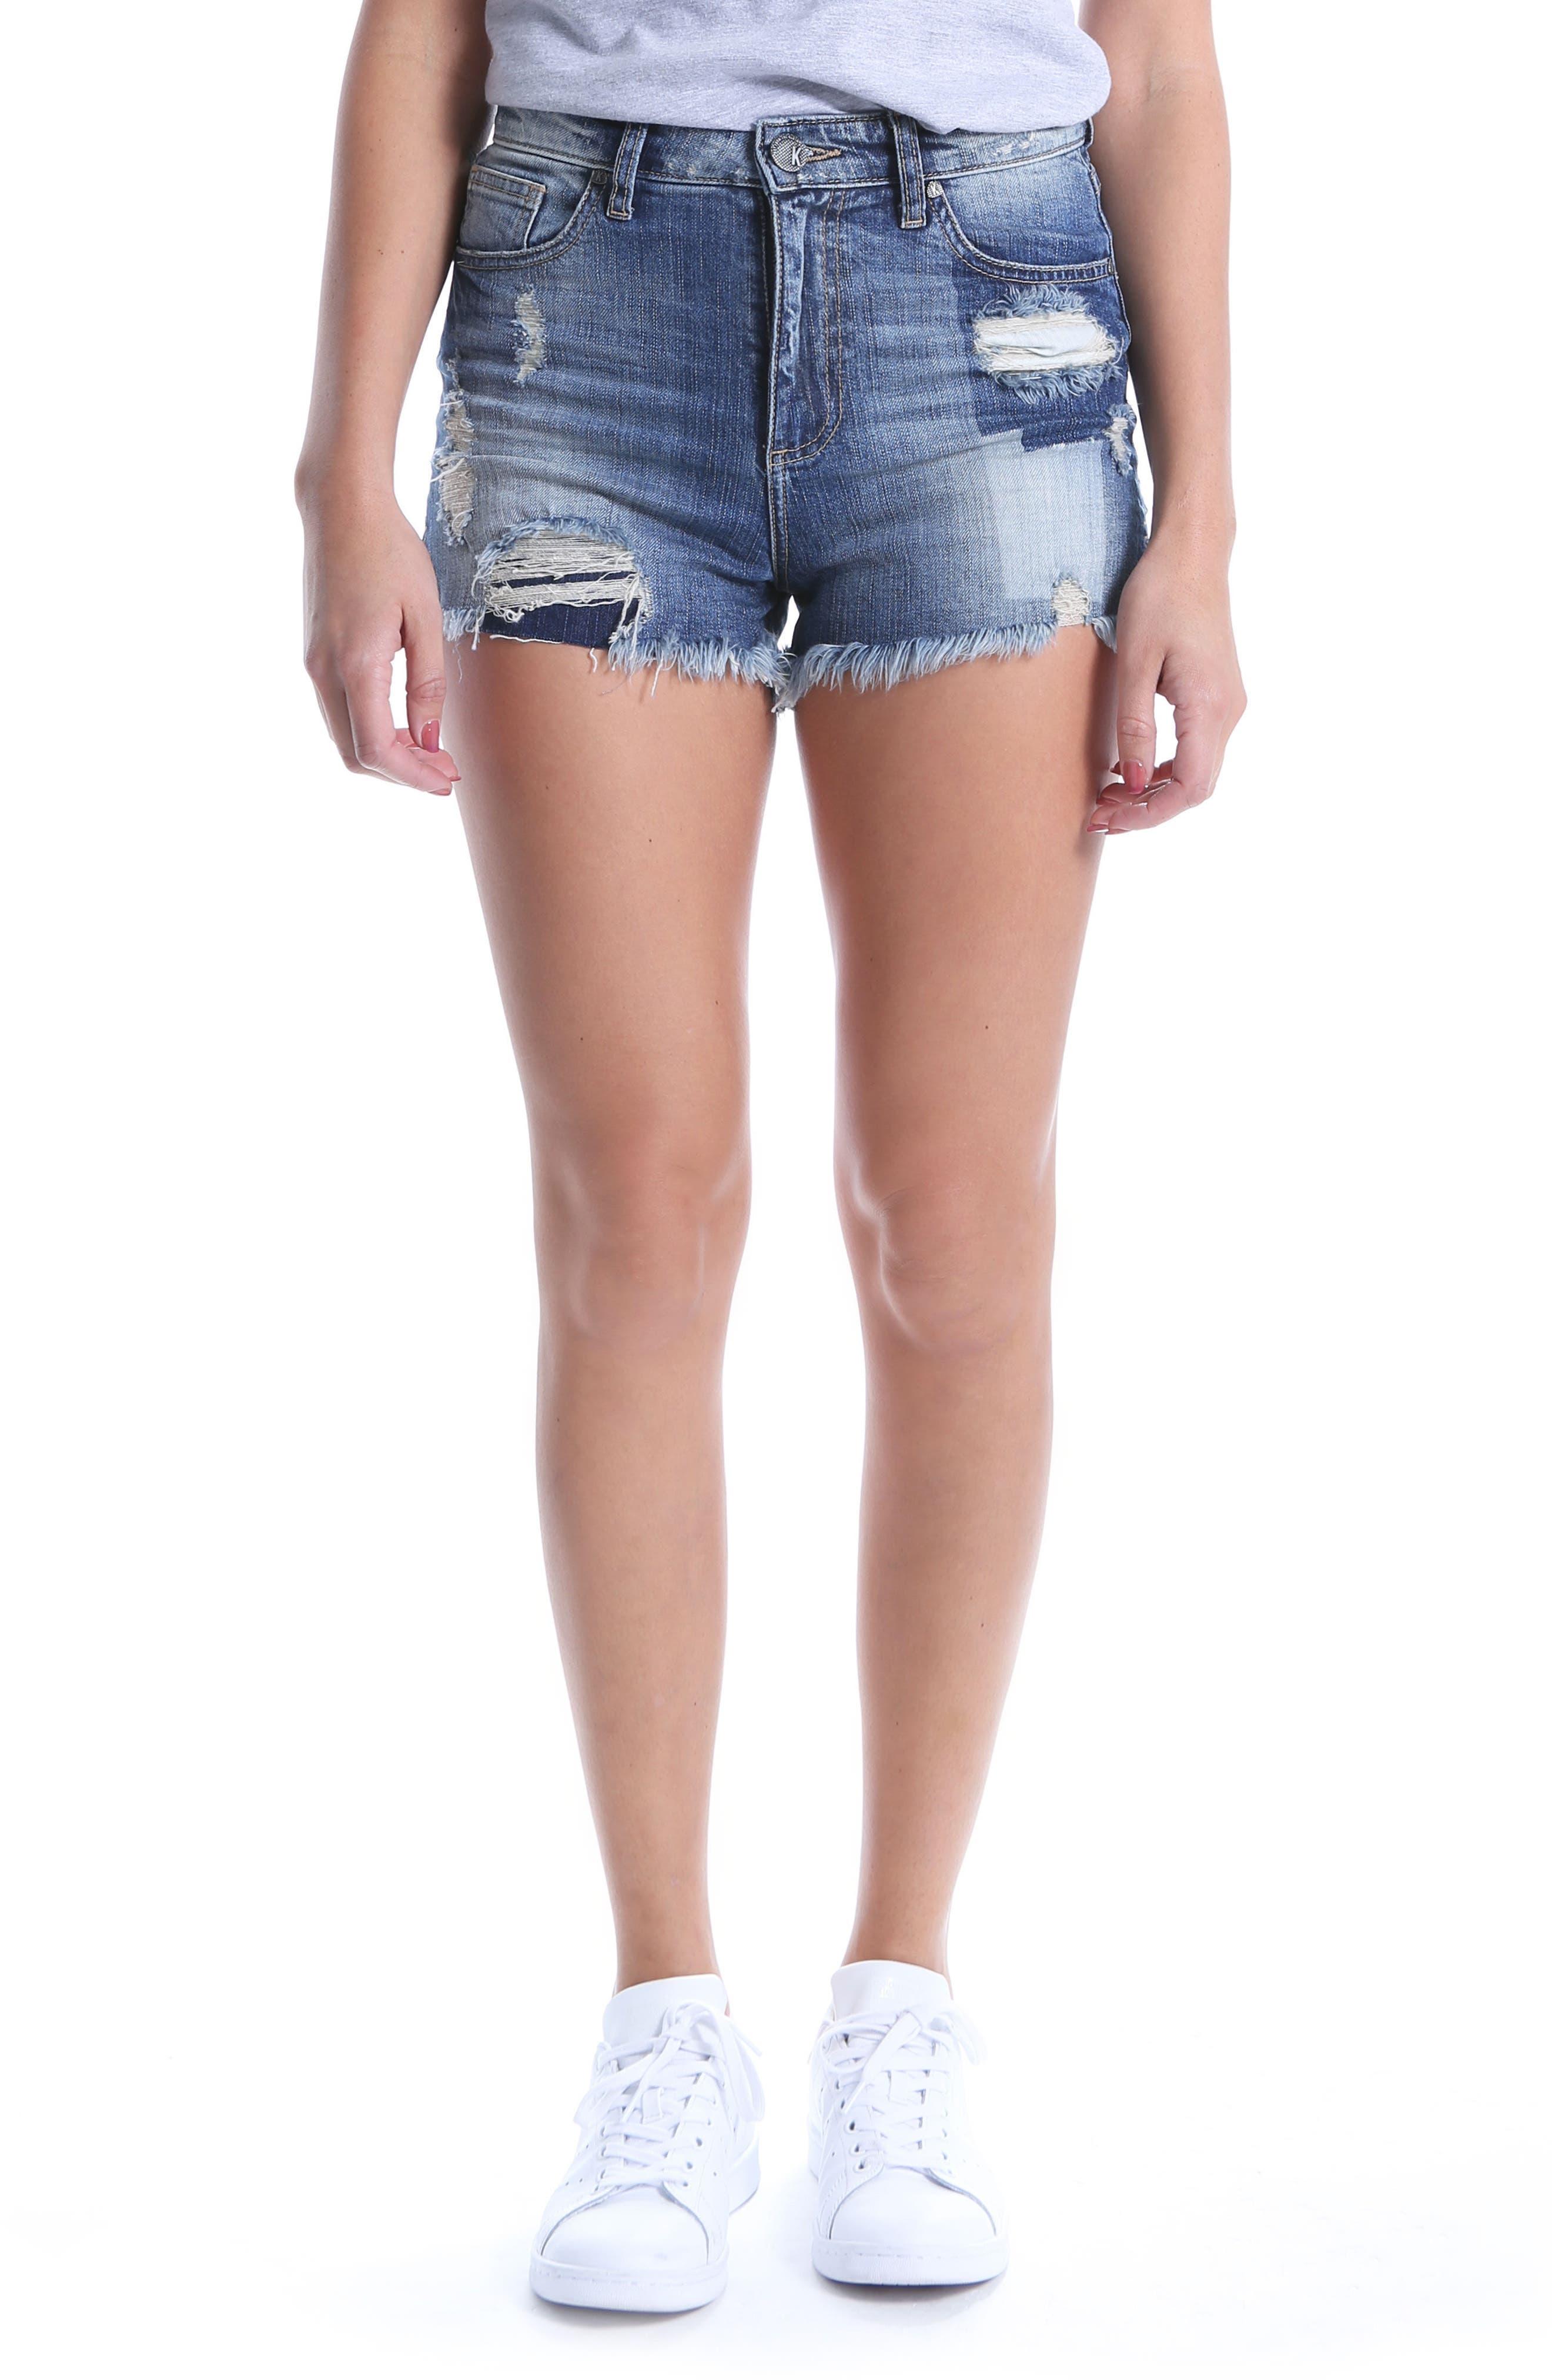 Main Image - KUT Kollection High Waist Ripped Denim Shorts (Debuted)